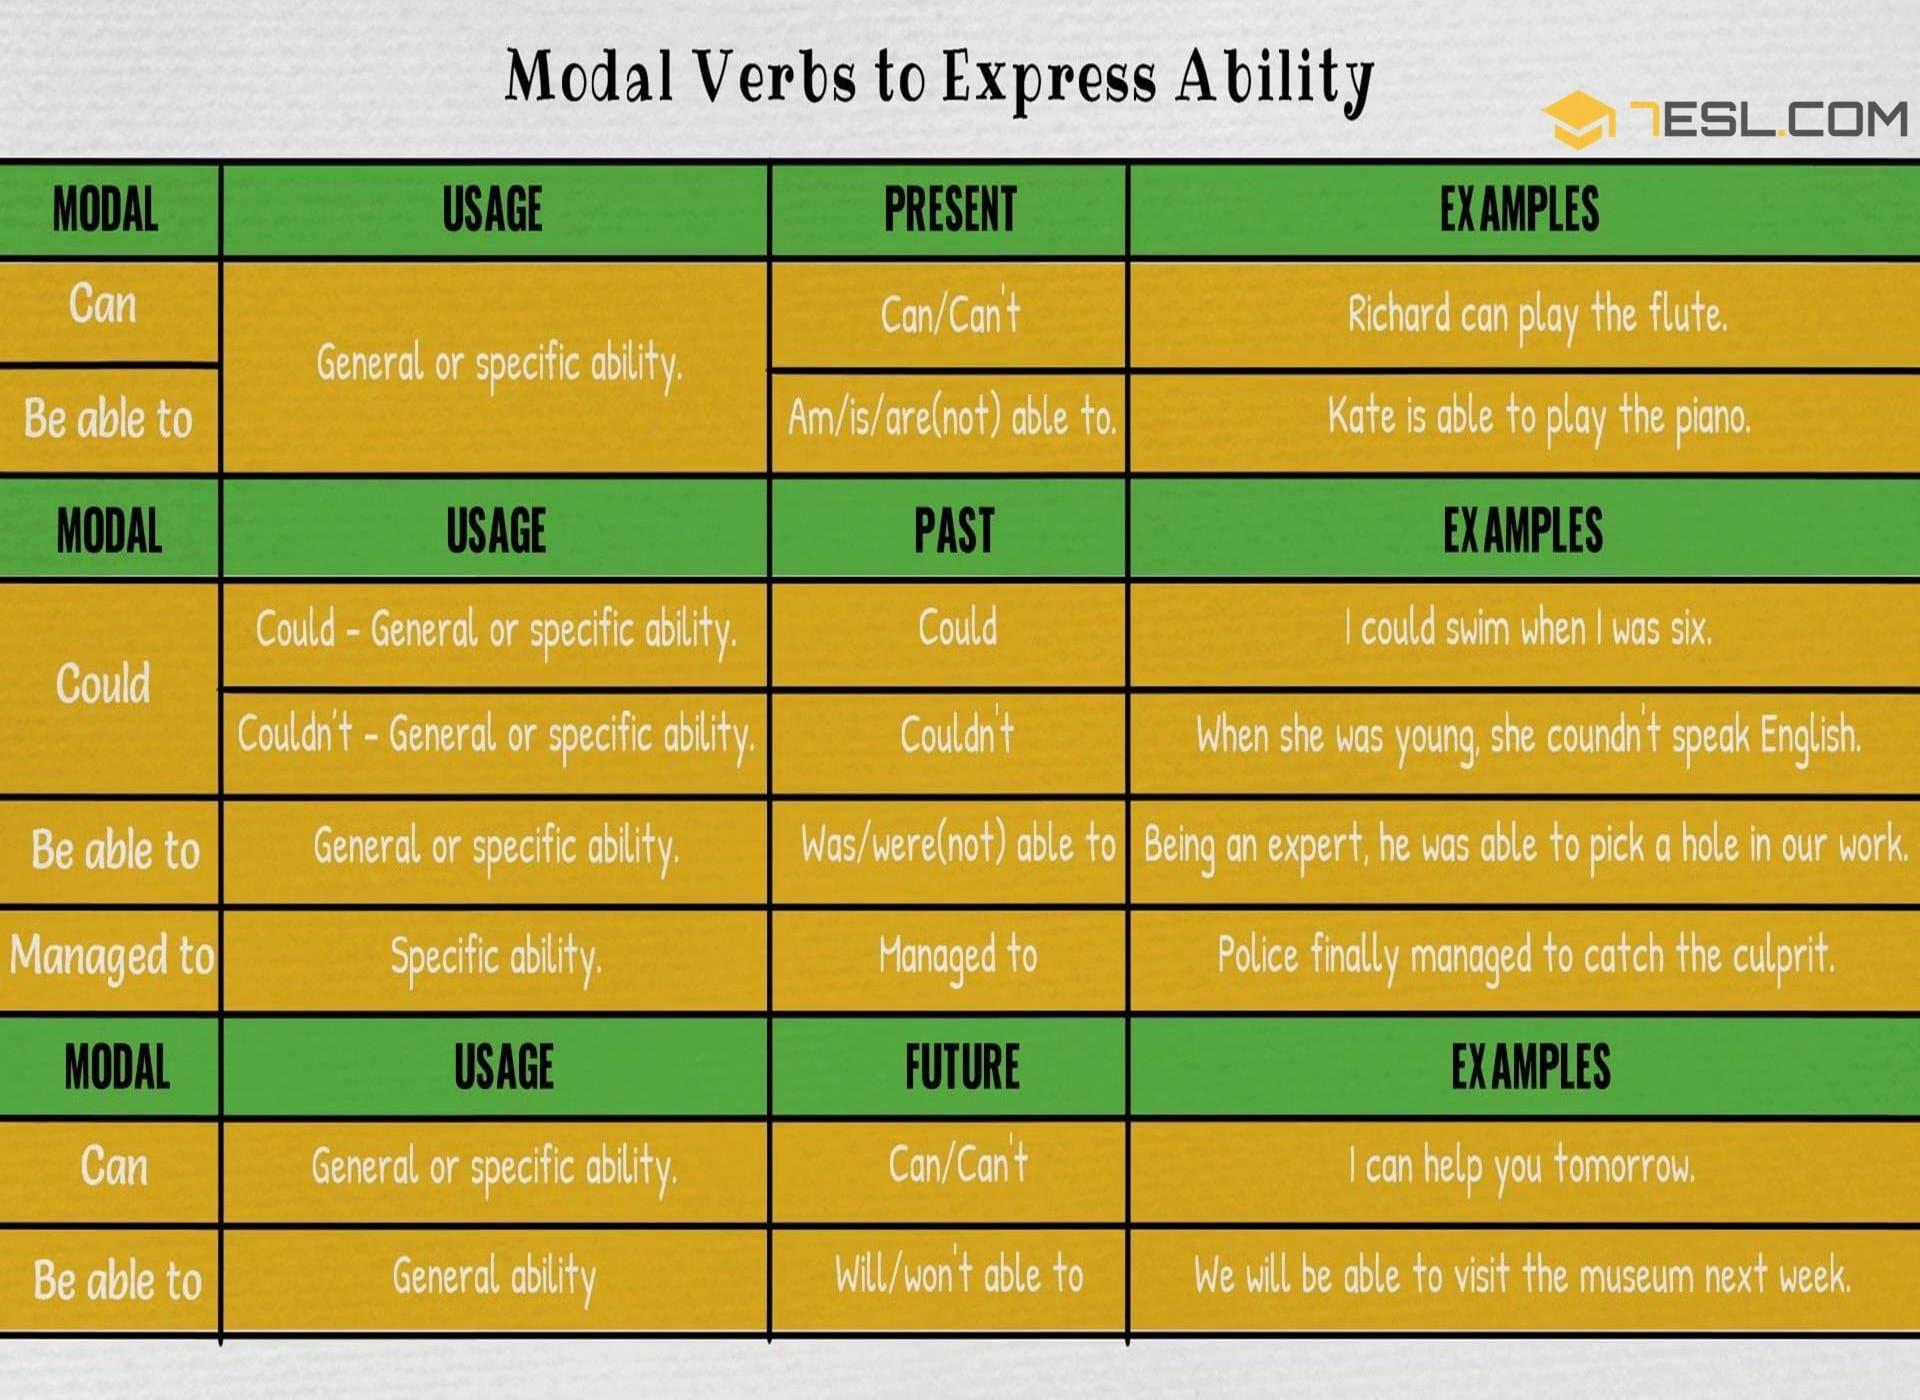 Modal Verbs To Express Ability